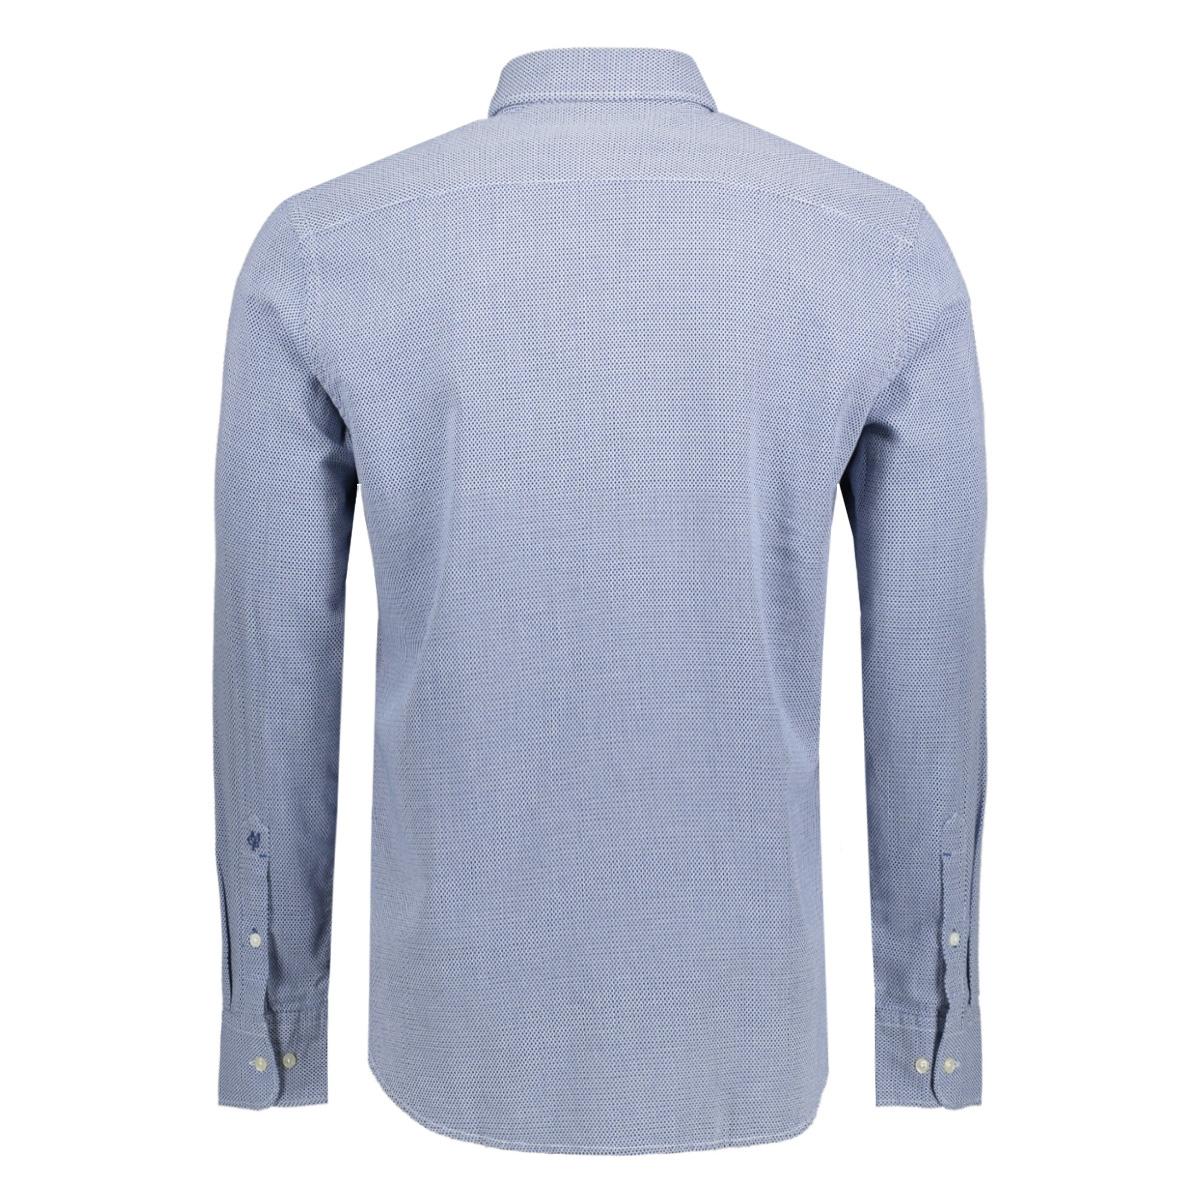 m27 7329 42190 marc o`polo overhemd v83